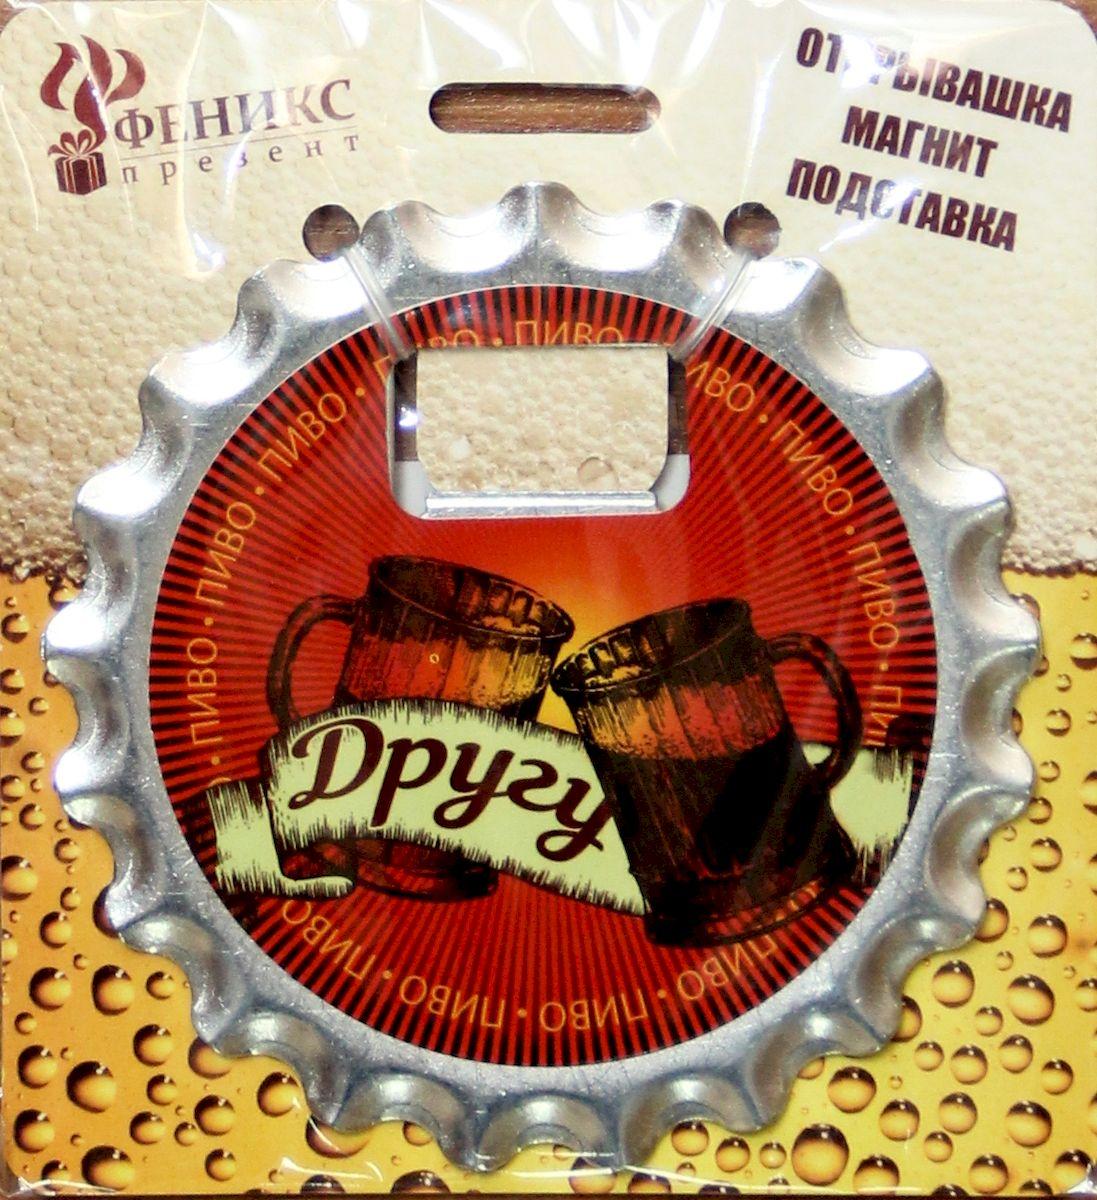 Ключ для открывания бутылок Magic Home Другу, с магнитом